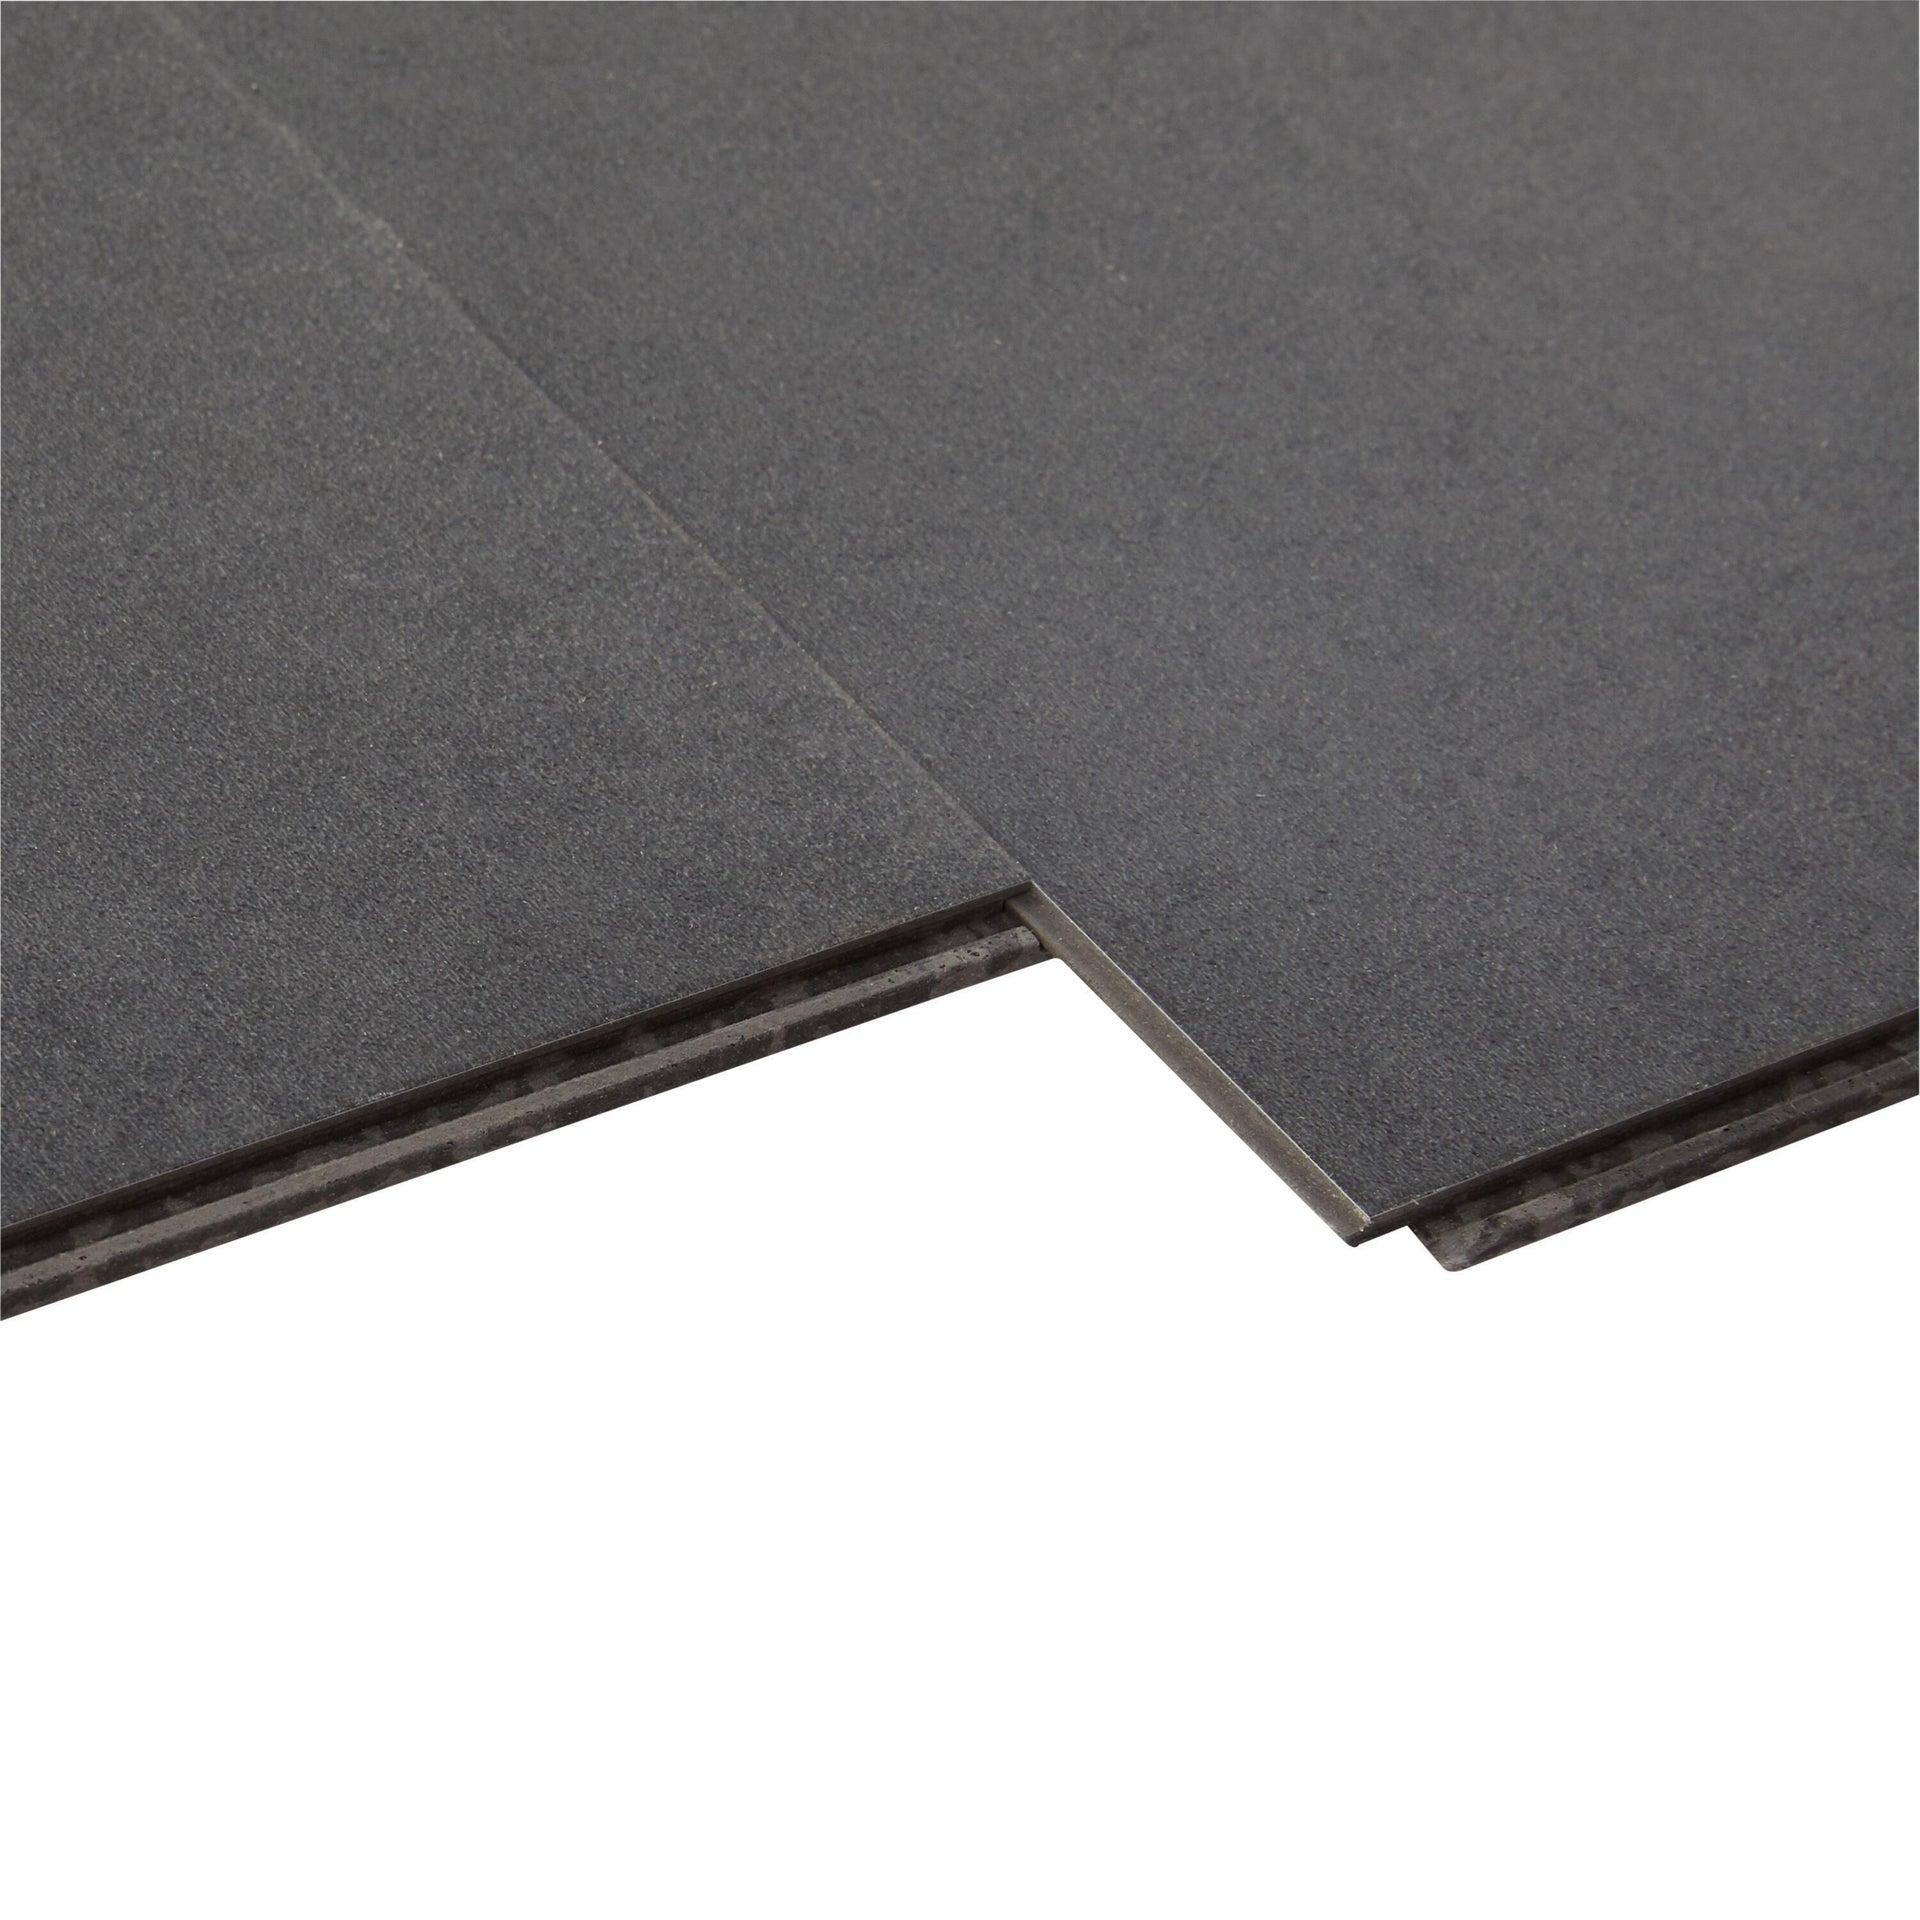 Pavimento PVC flottante clic+ Art For New Sp 4.2 mm nero - 3